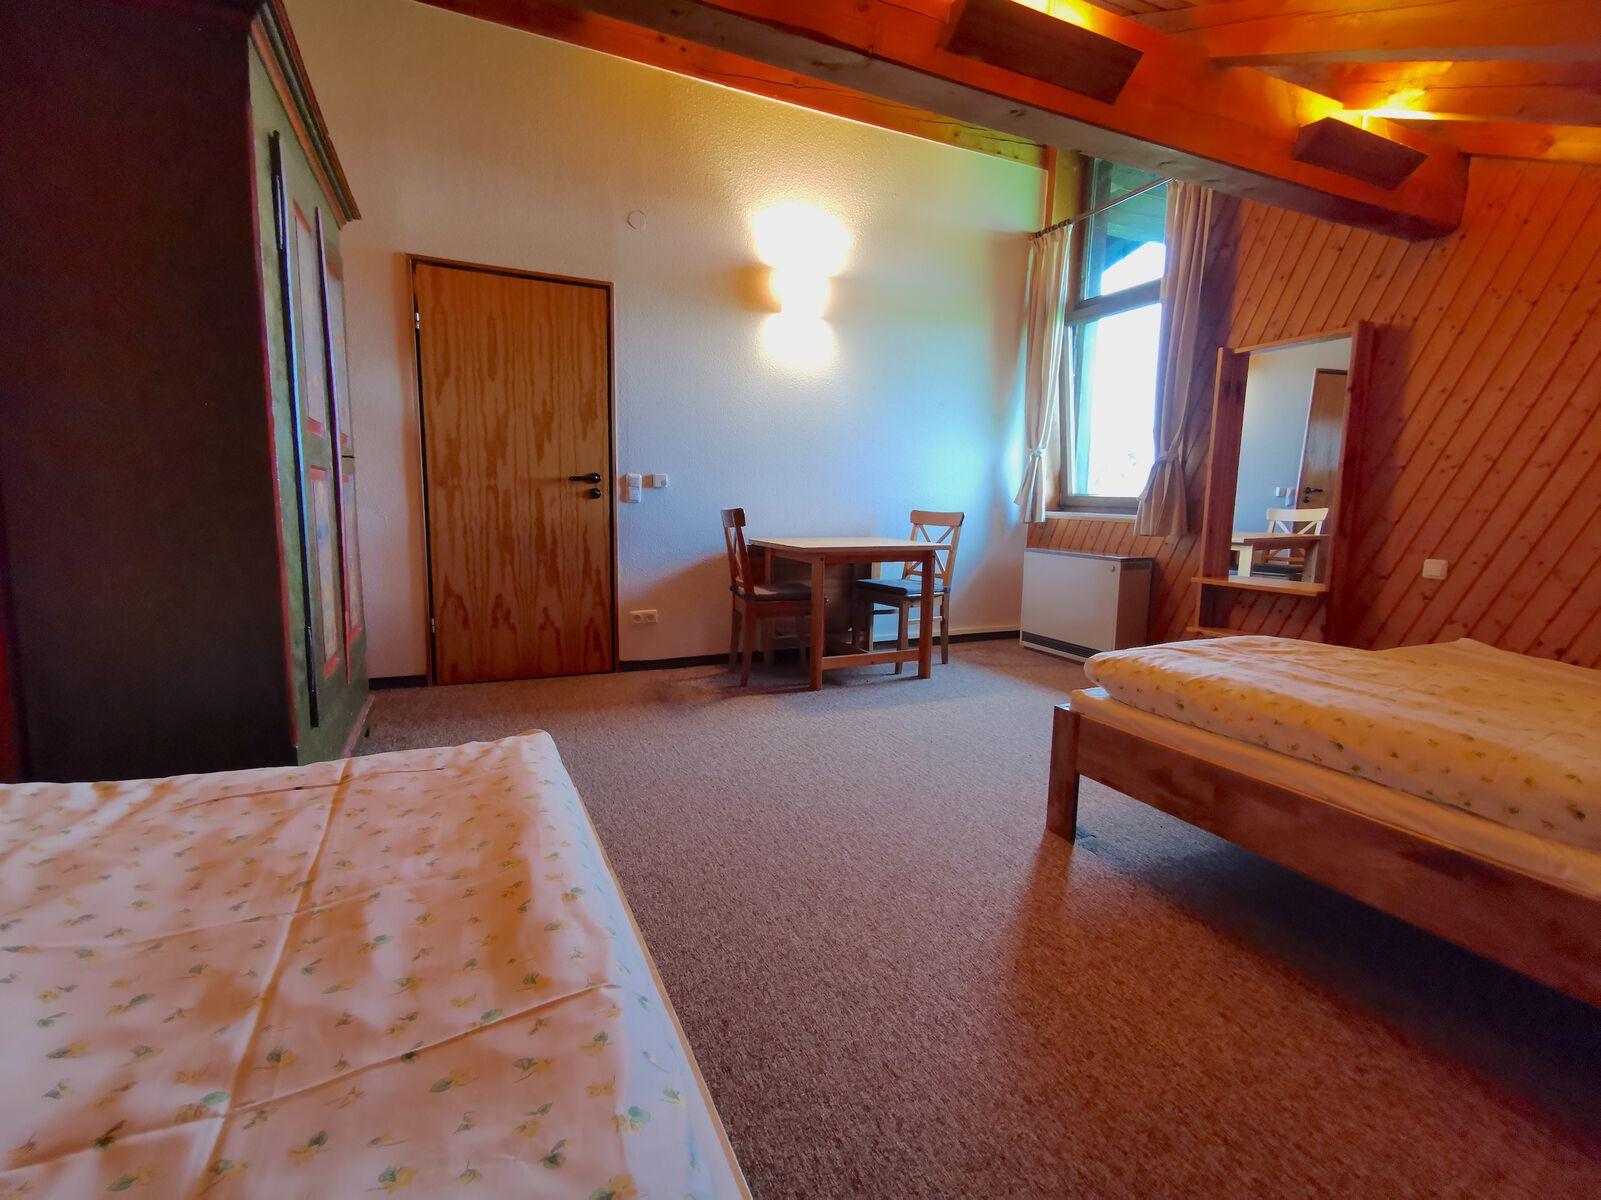 Schlafzimmer 4 OG: